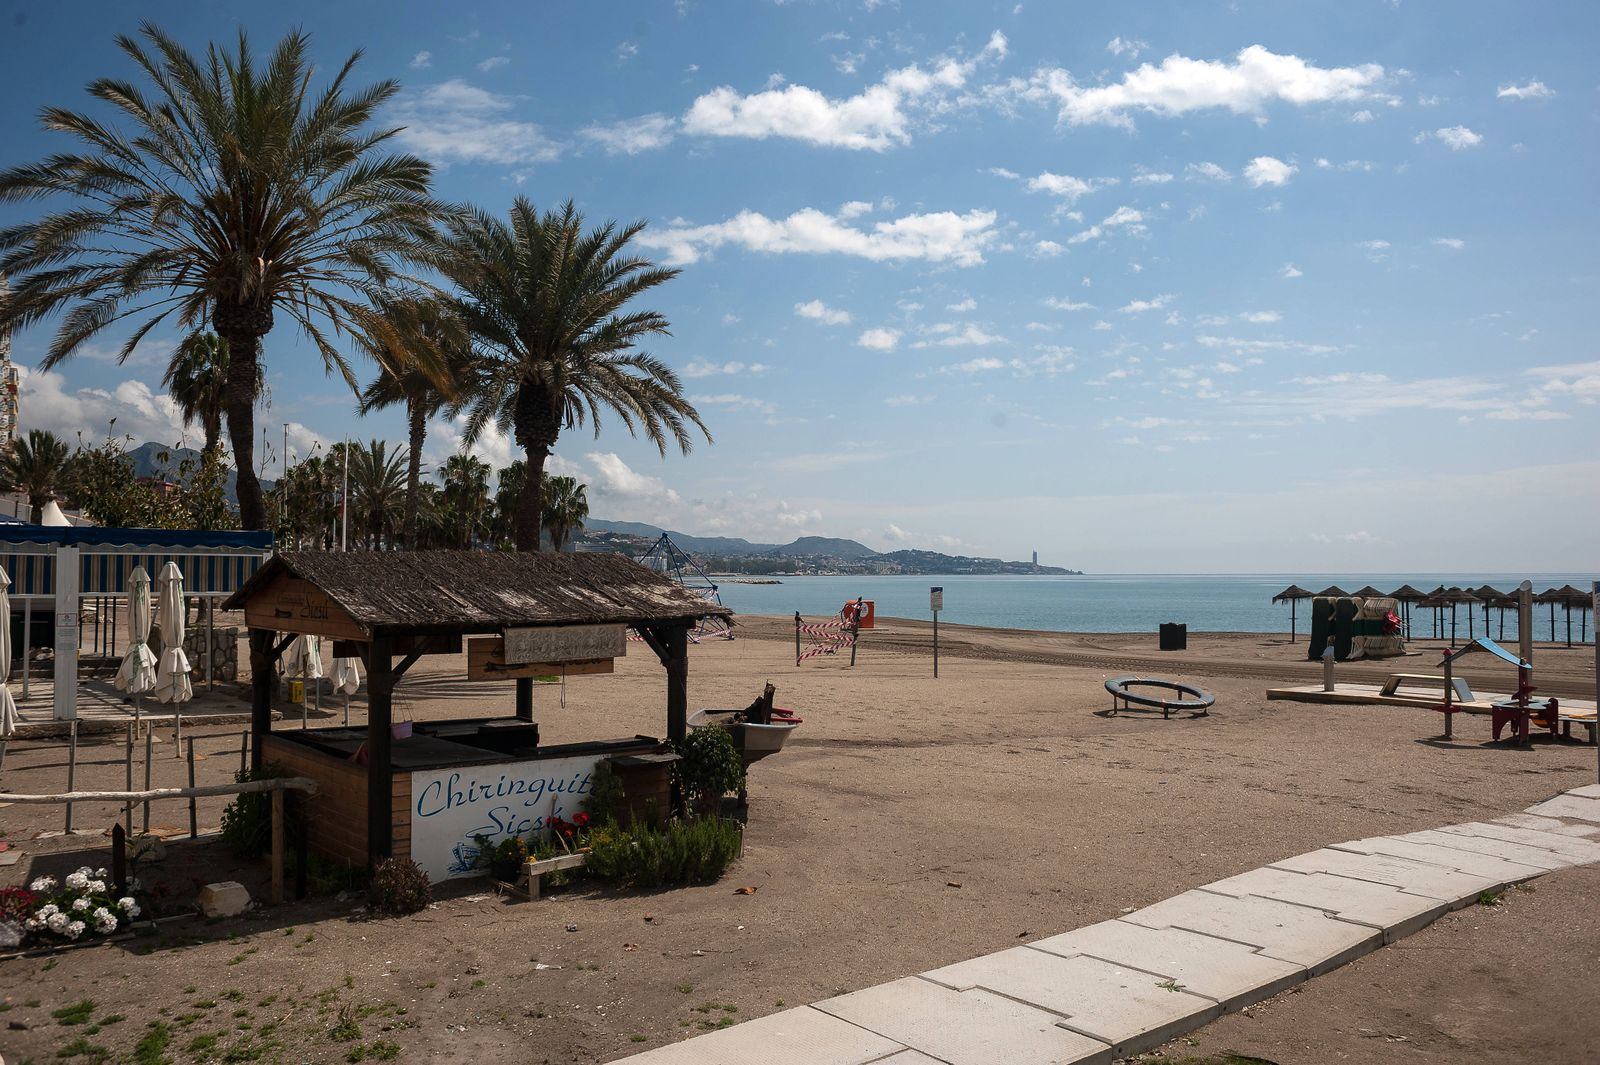 April 14, 2020, Malaga, Spain: Malagueta beach closed due to the confinement regulations amid coronavirus outbreak..Span